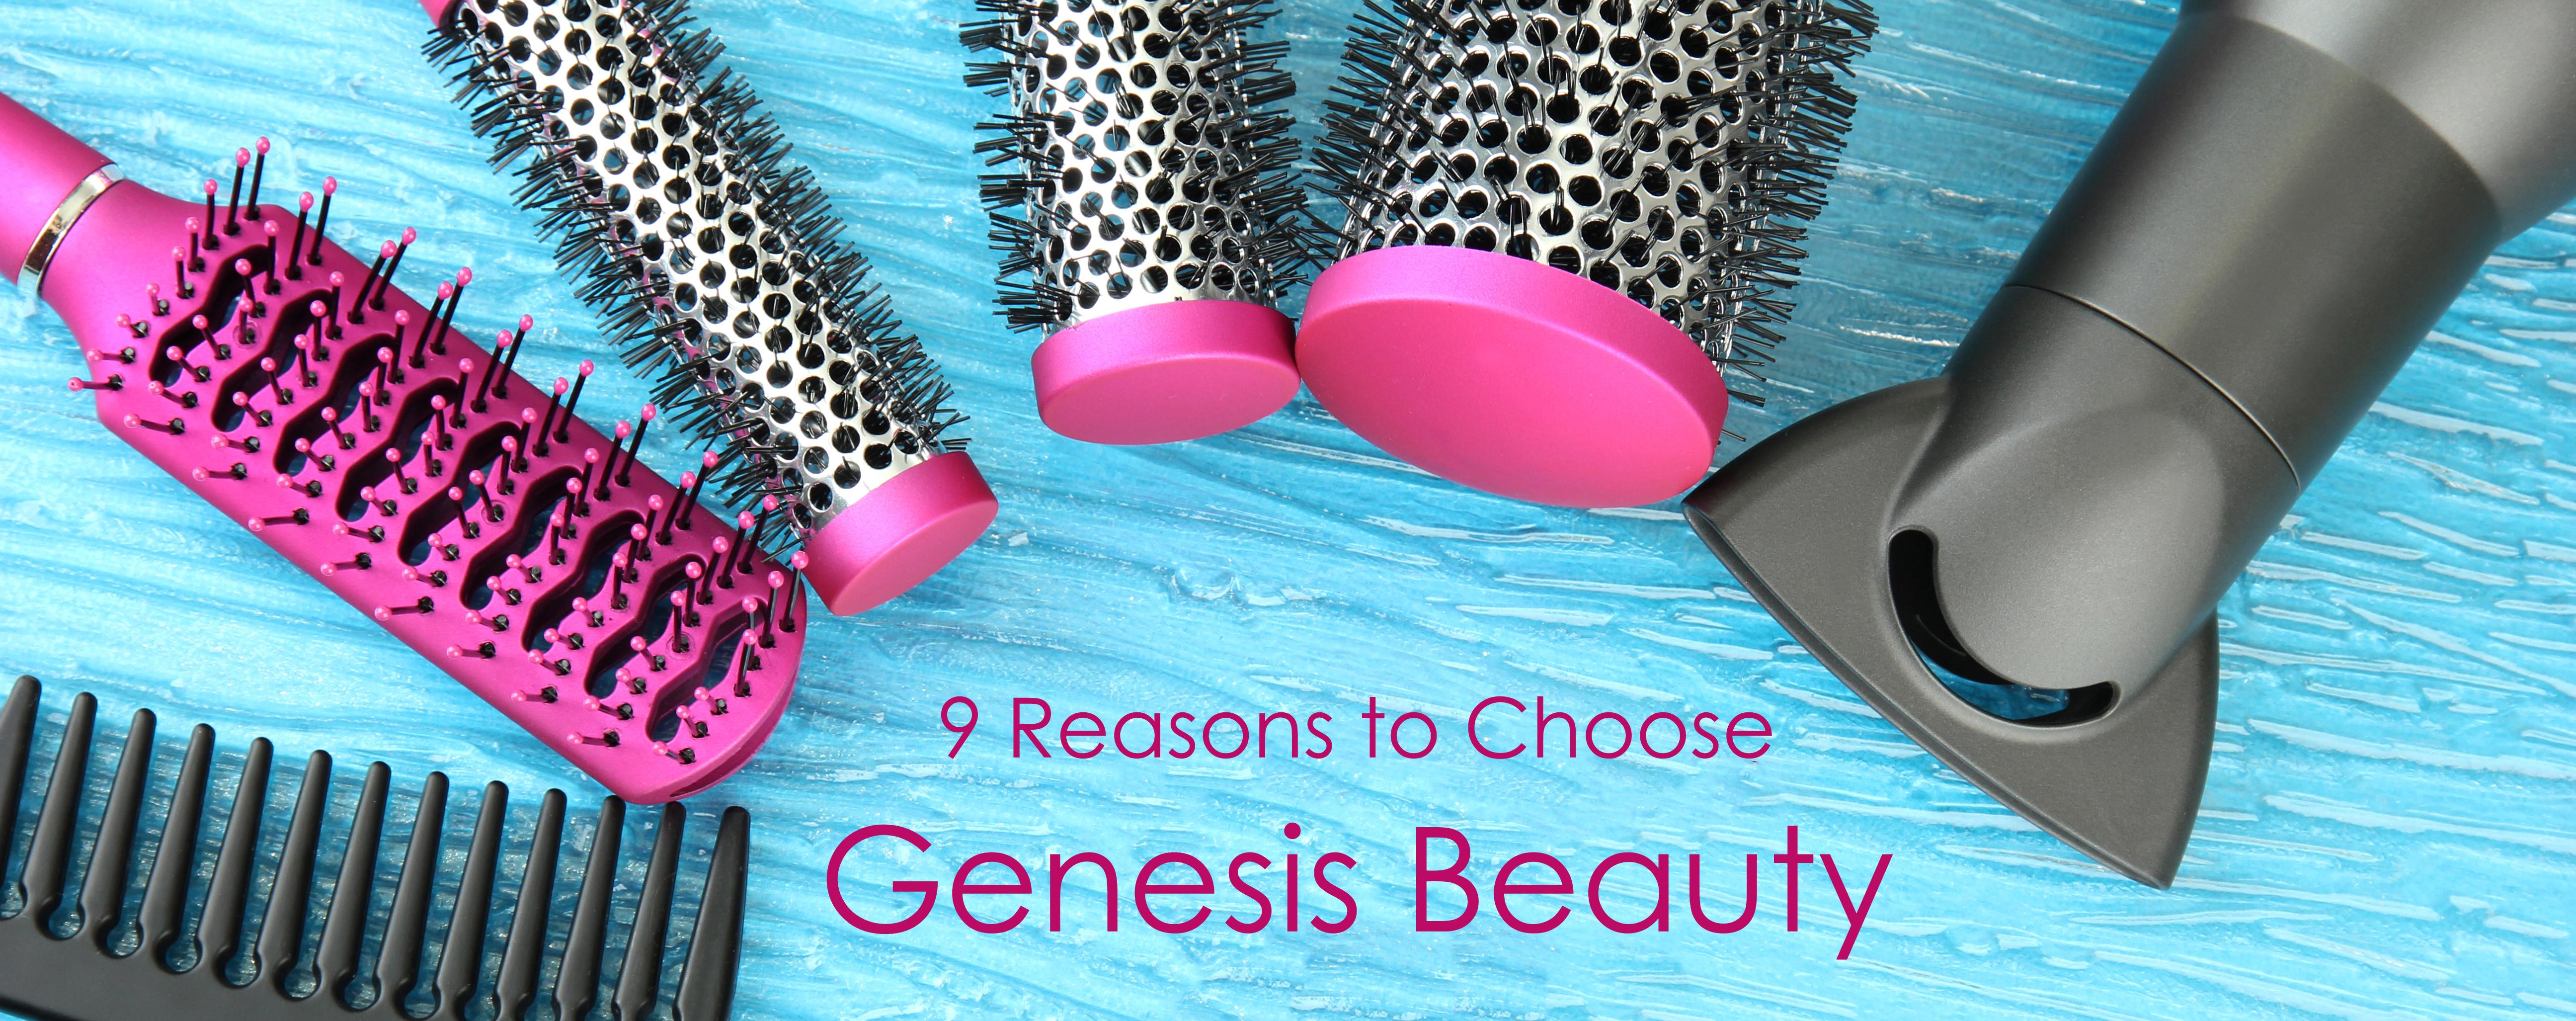 Salon Equipment & Furniture   Genesis Beauty